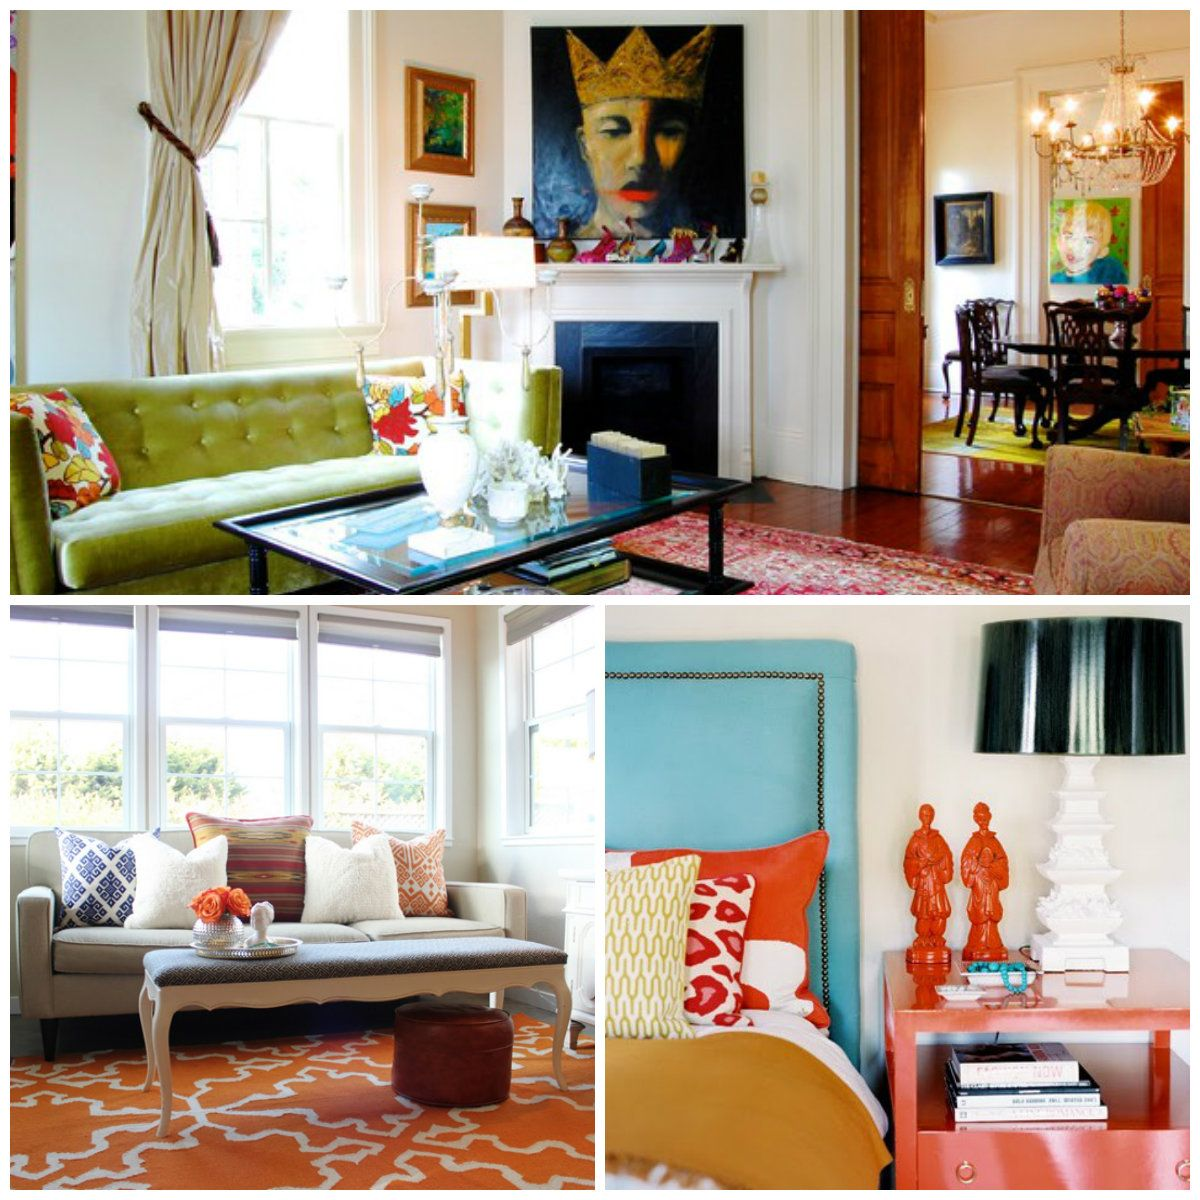 Eclectichomedecorg home décor pinterest